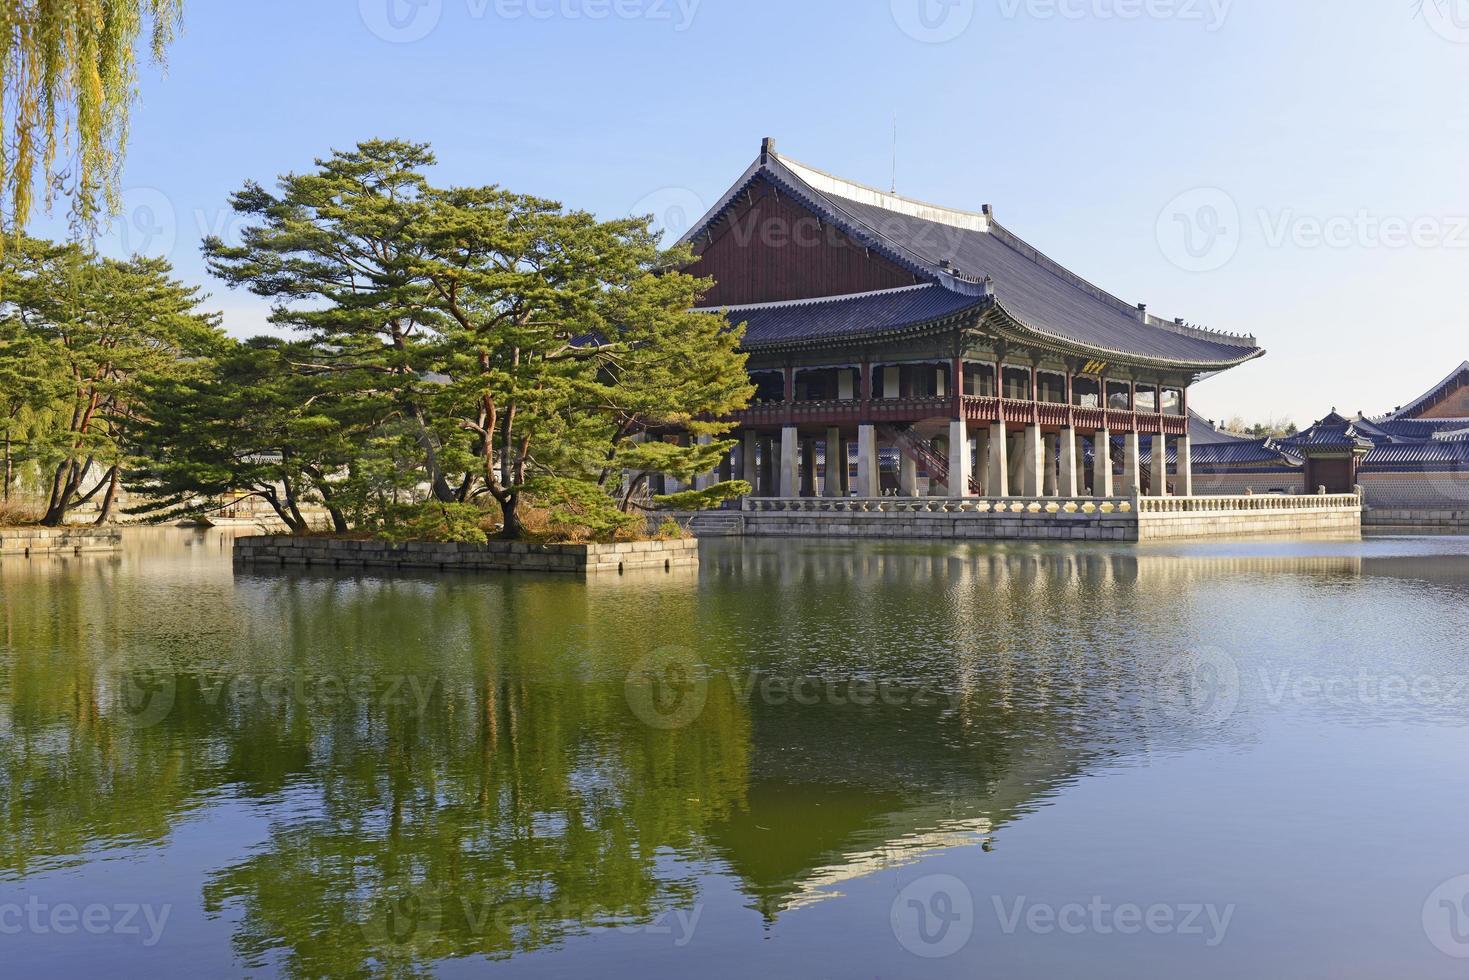 pavilhão gyeonghoeru no palácio gyeongbokgung, seul, coréia foto